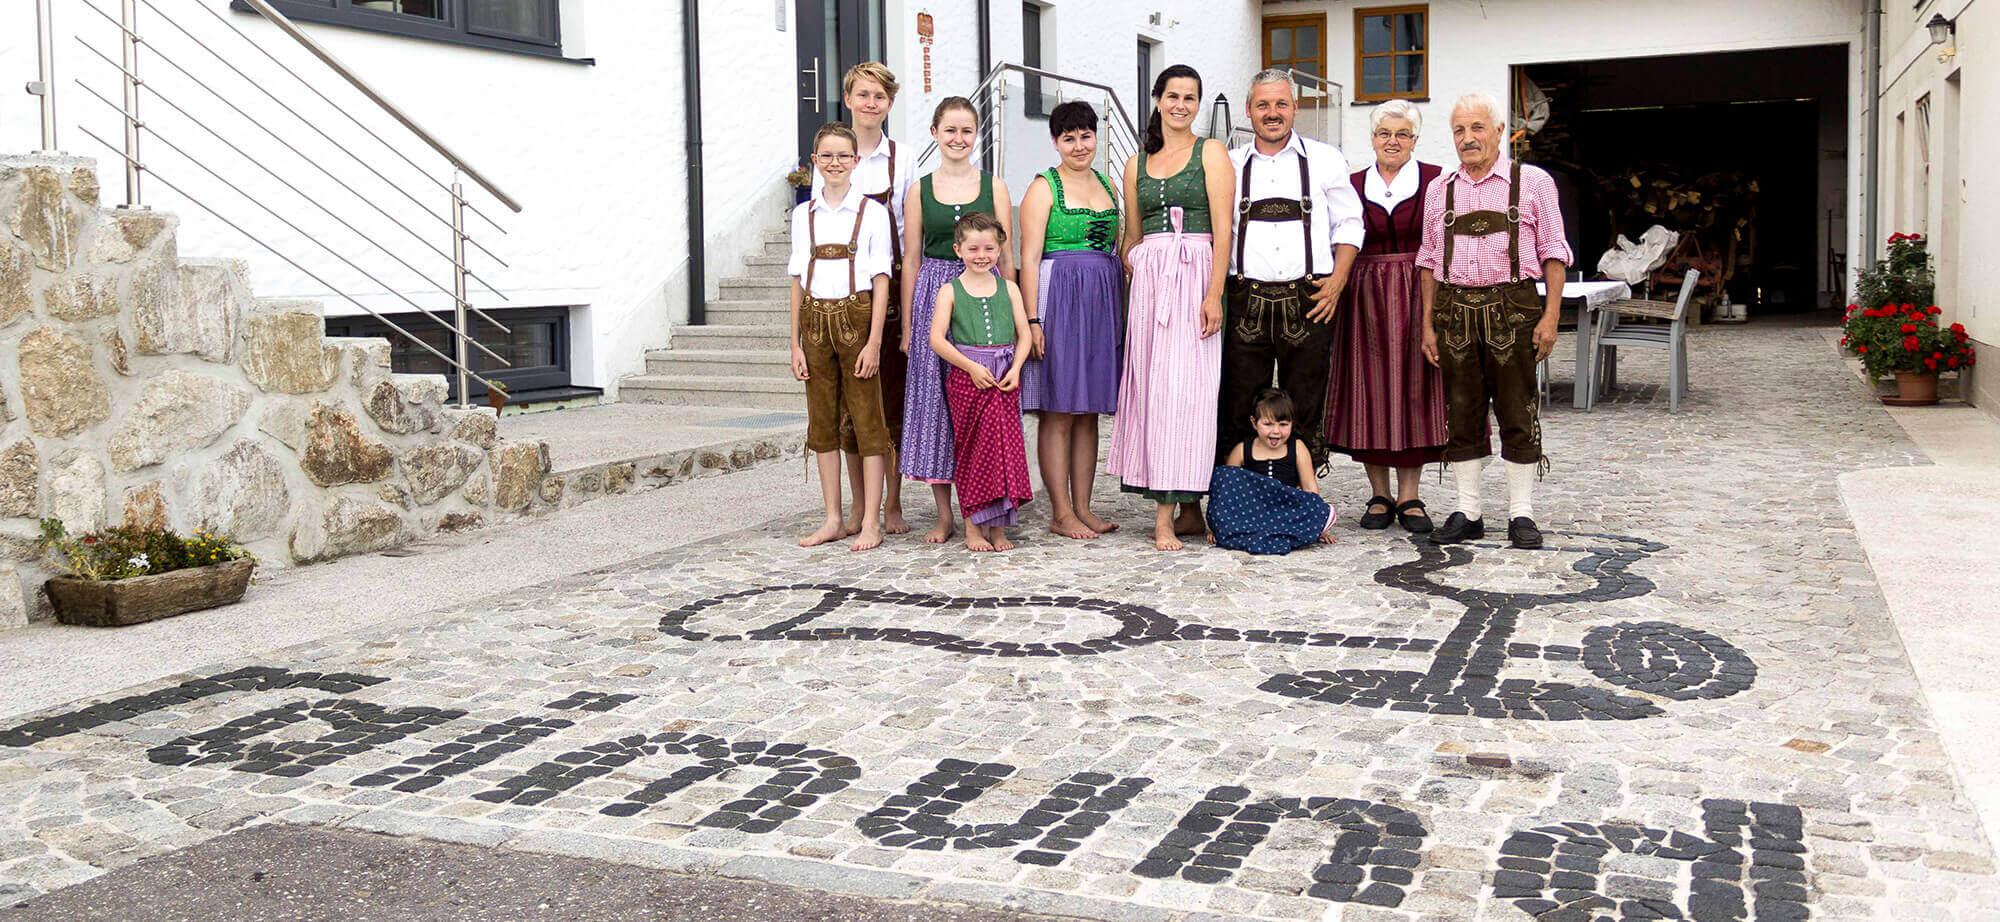 Familie Kapeller Biohof Raimund